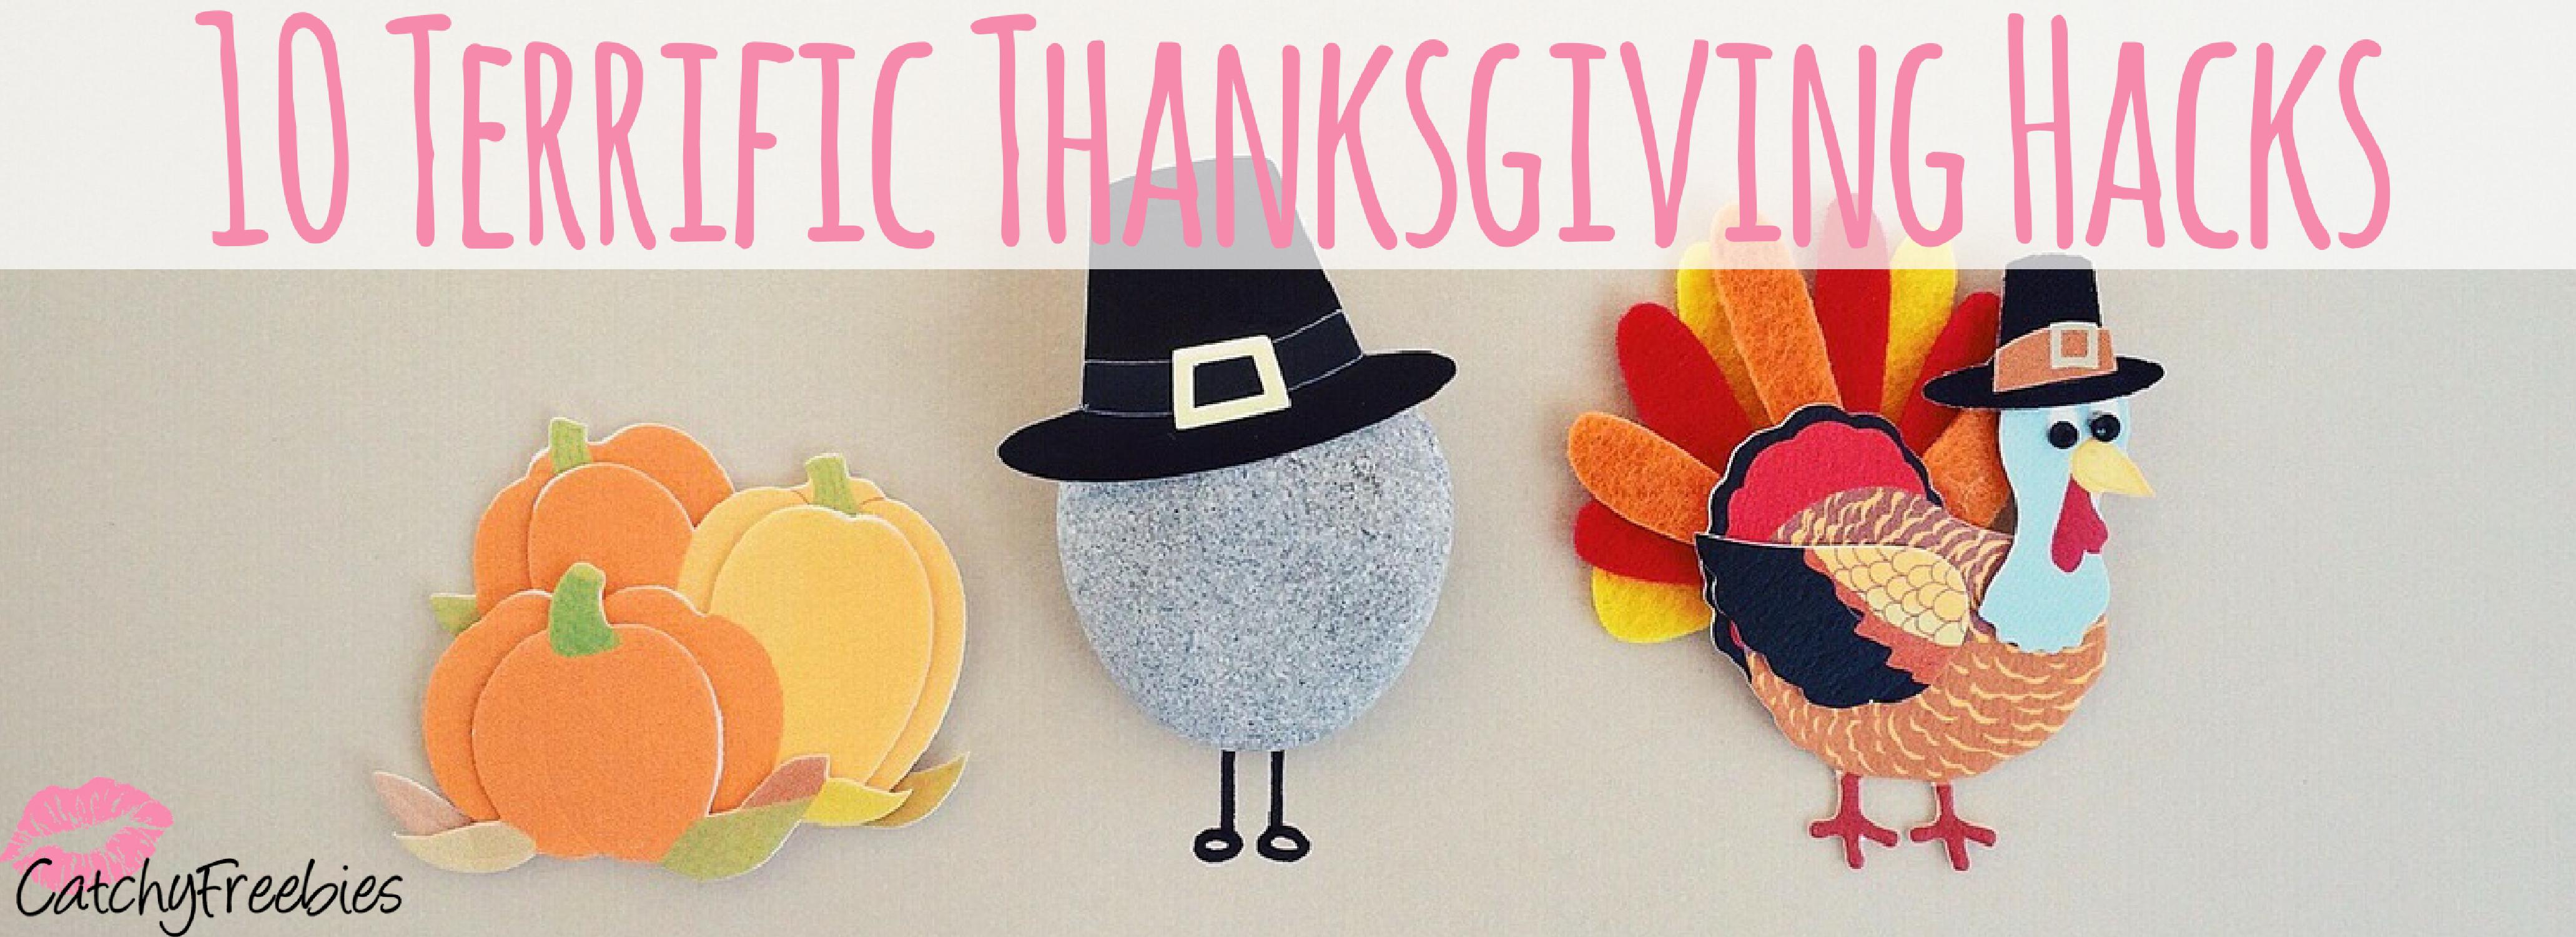 10 Terrific Thanksgiving Hacks